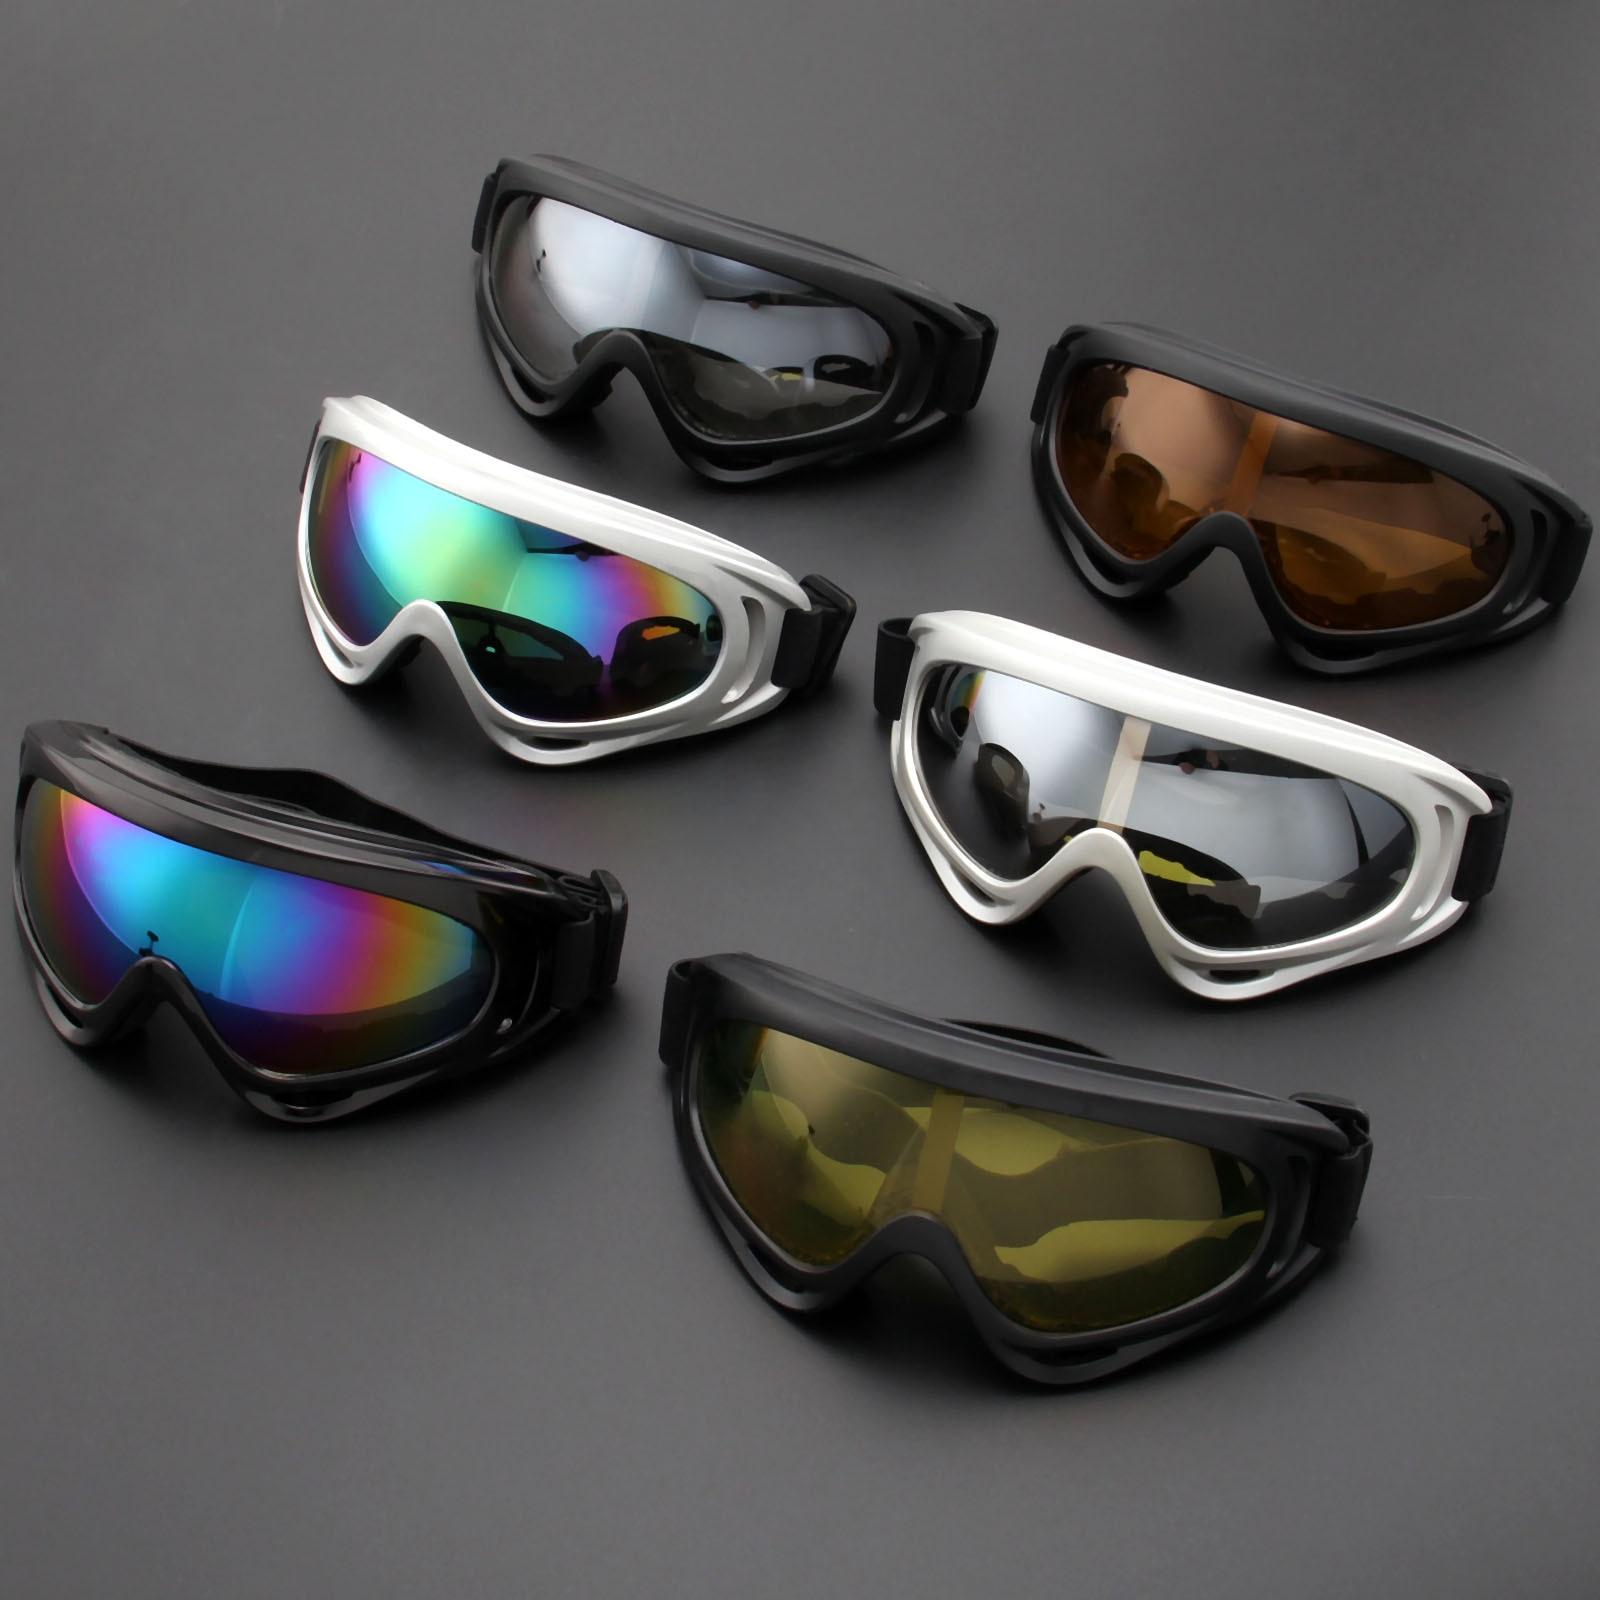 Motorcycle Glasses Anti Motor Sunglasses Sports Ski Goggles Windproof Dustproof UV Protection off-Road Hemlet Bike Eyewear